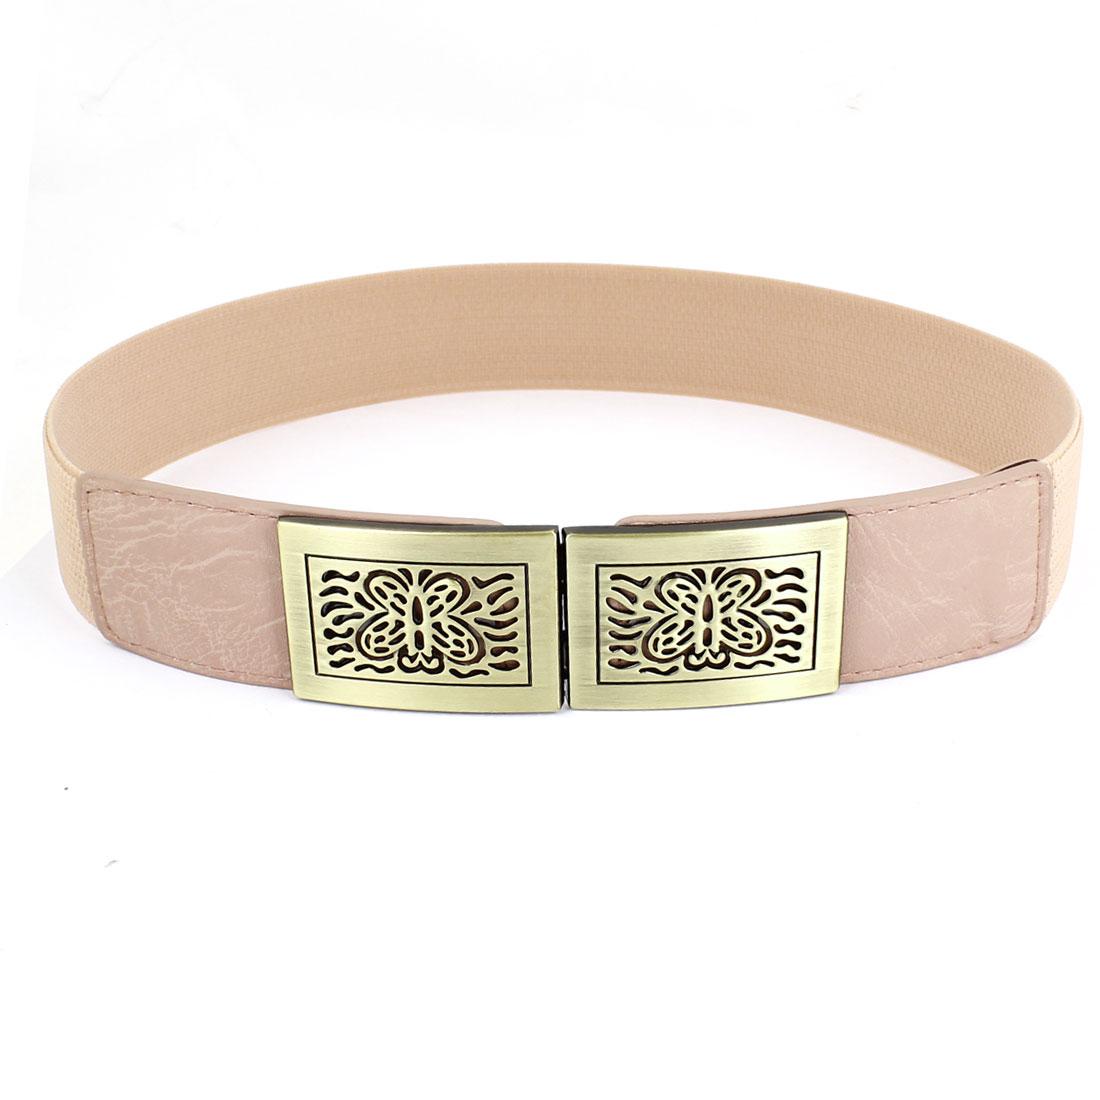 Bronze Tone Butterfly Interlock Buckle Elastic Cinch Belt Pink for Women